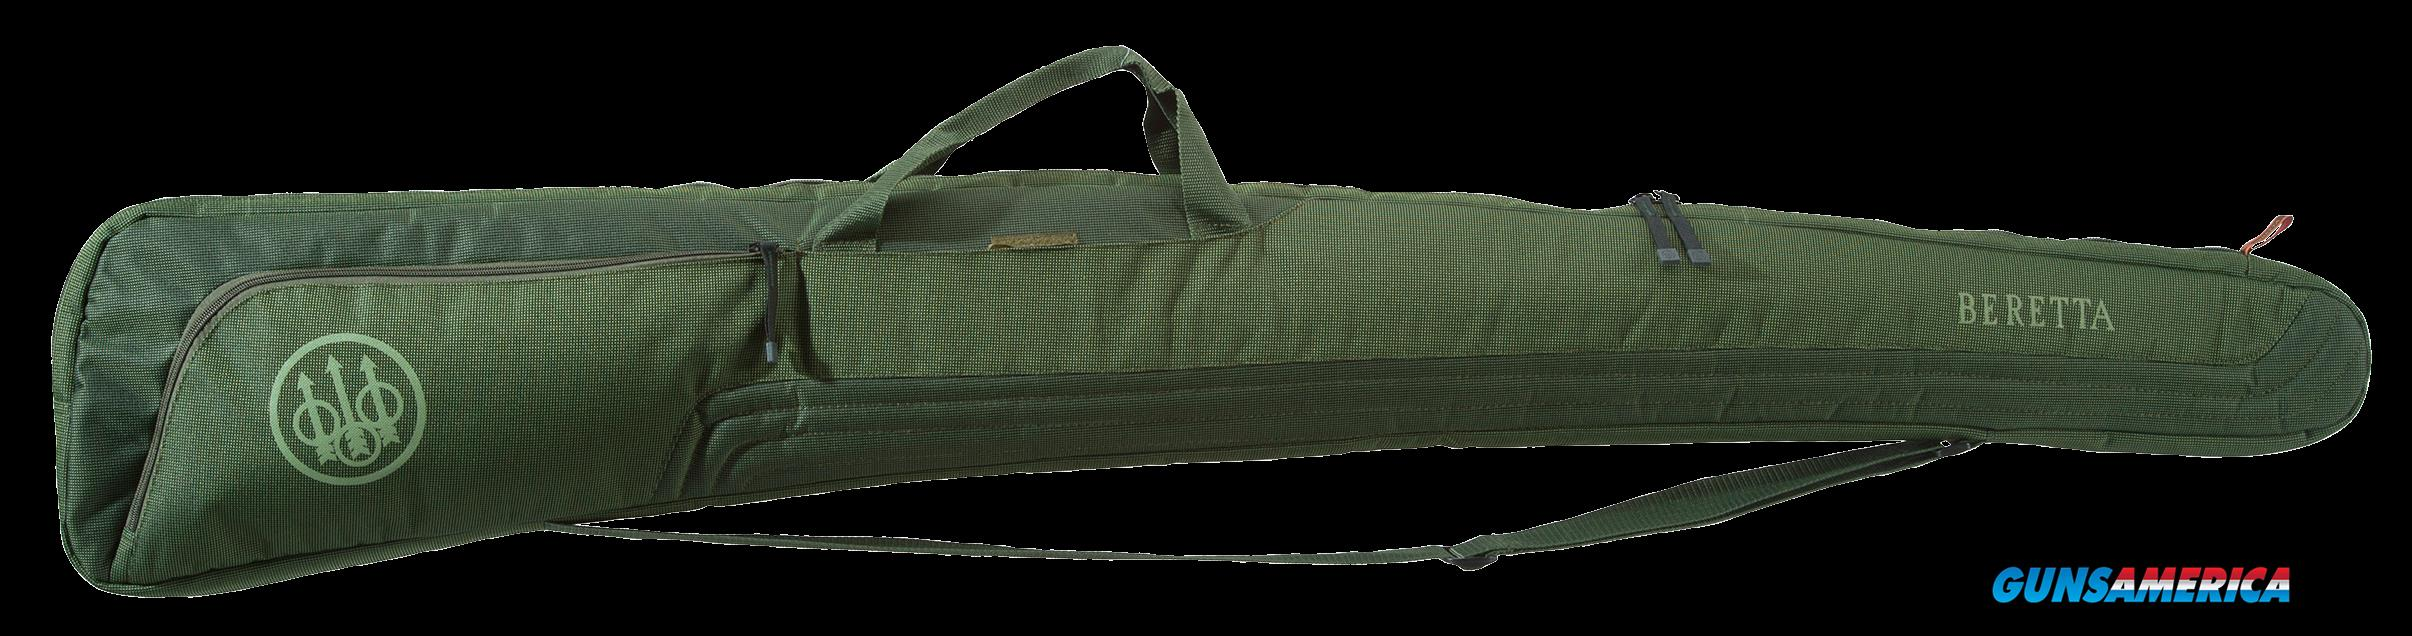 Beretta Usa B-wild, Ber Fo191t16110789uni Bwild Long Gun Case  Guns > Pistols > 1911 Pistol Copies (non-Colt)